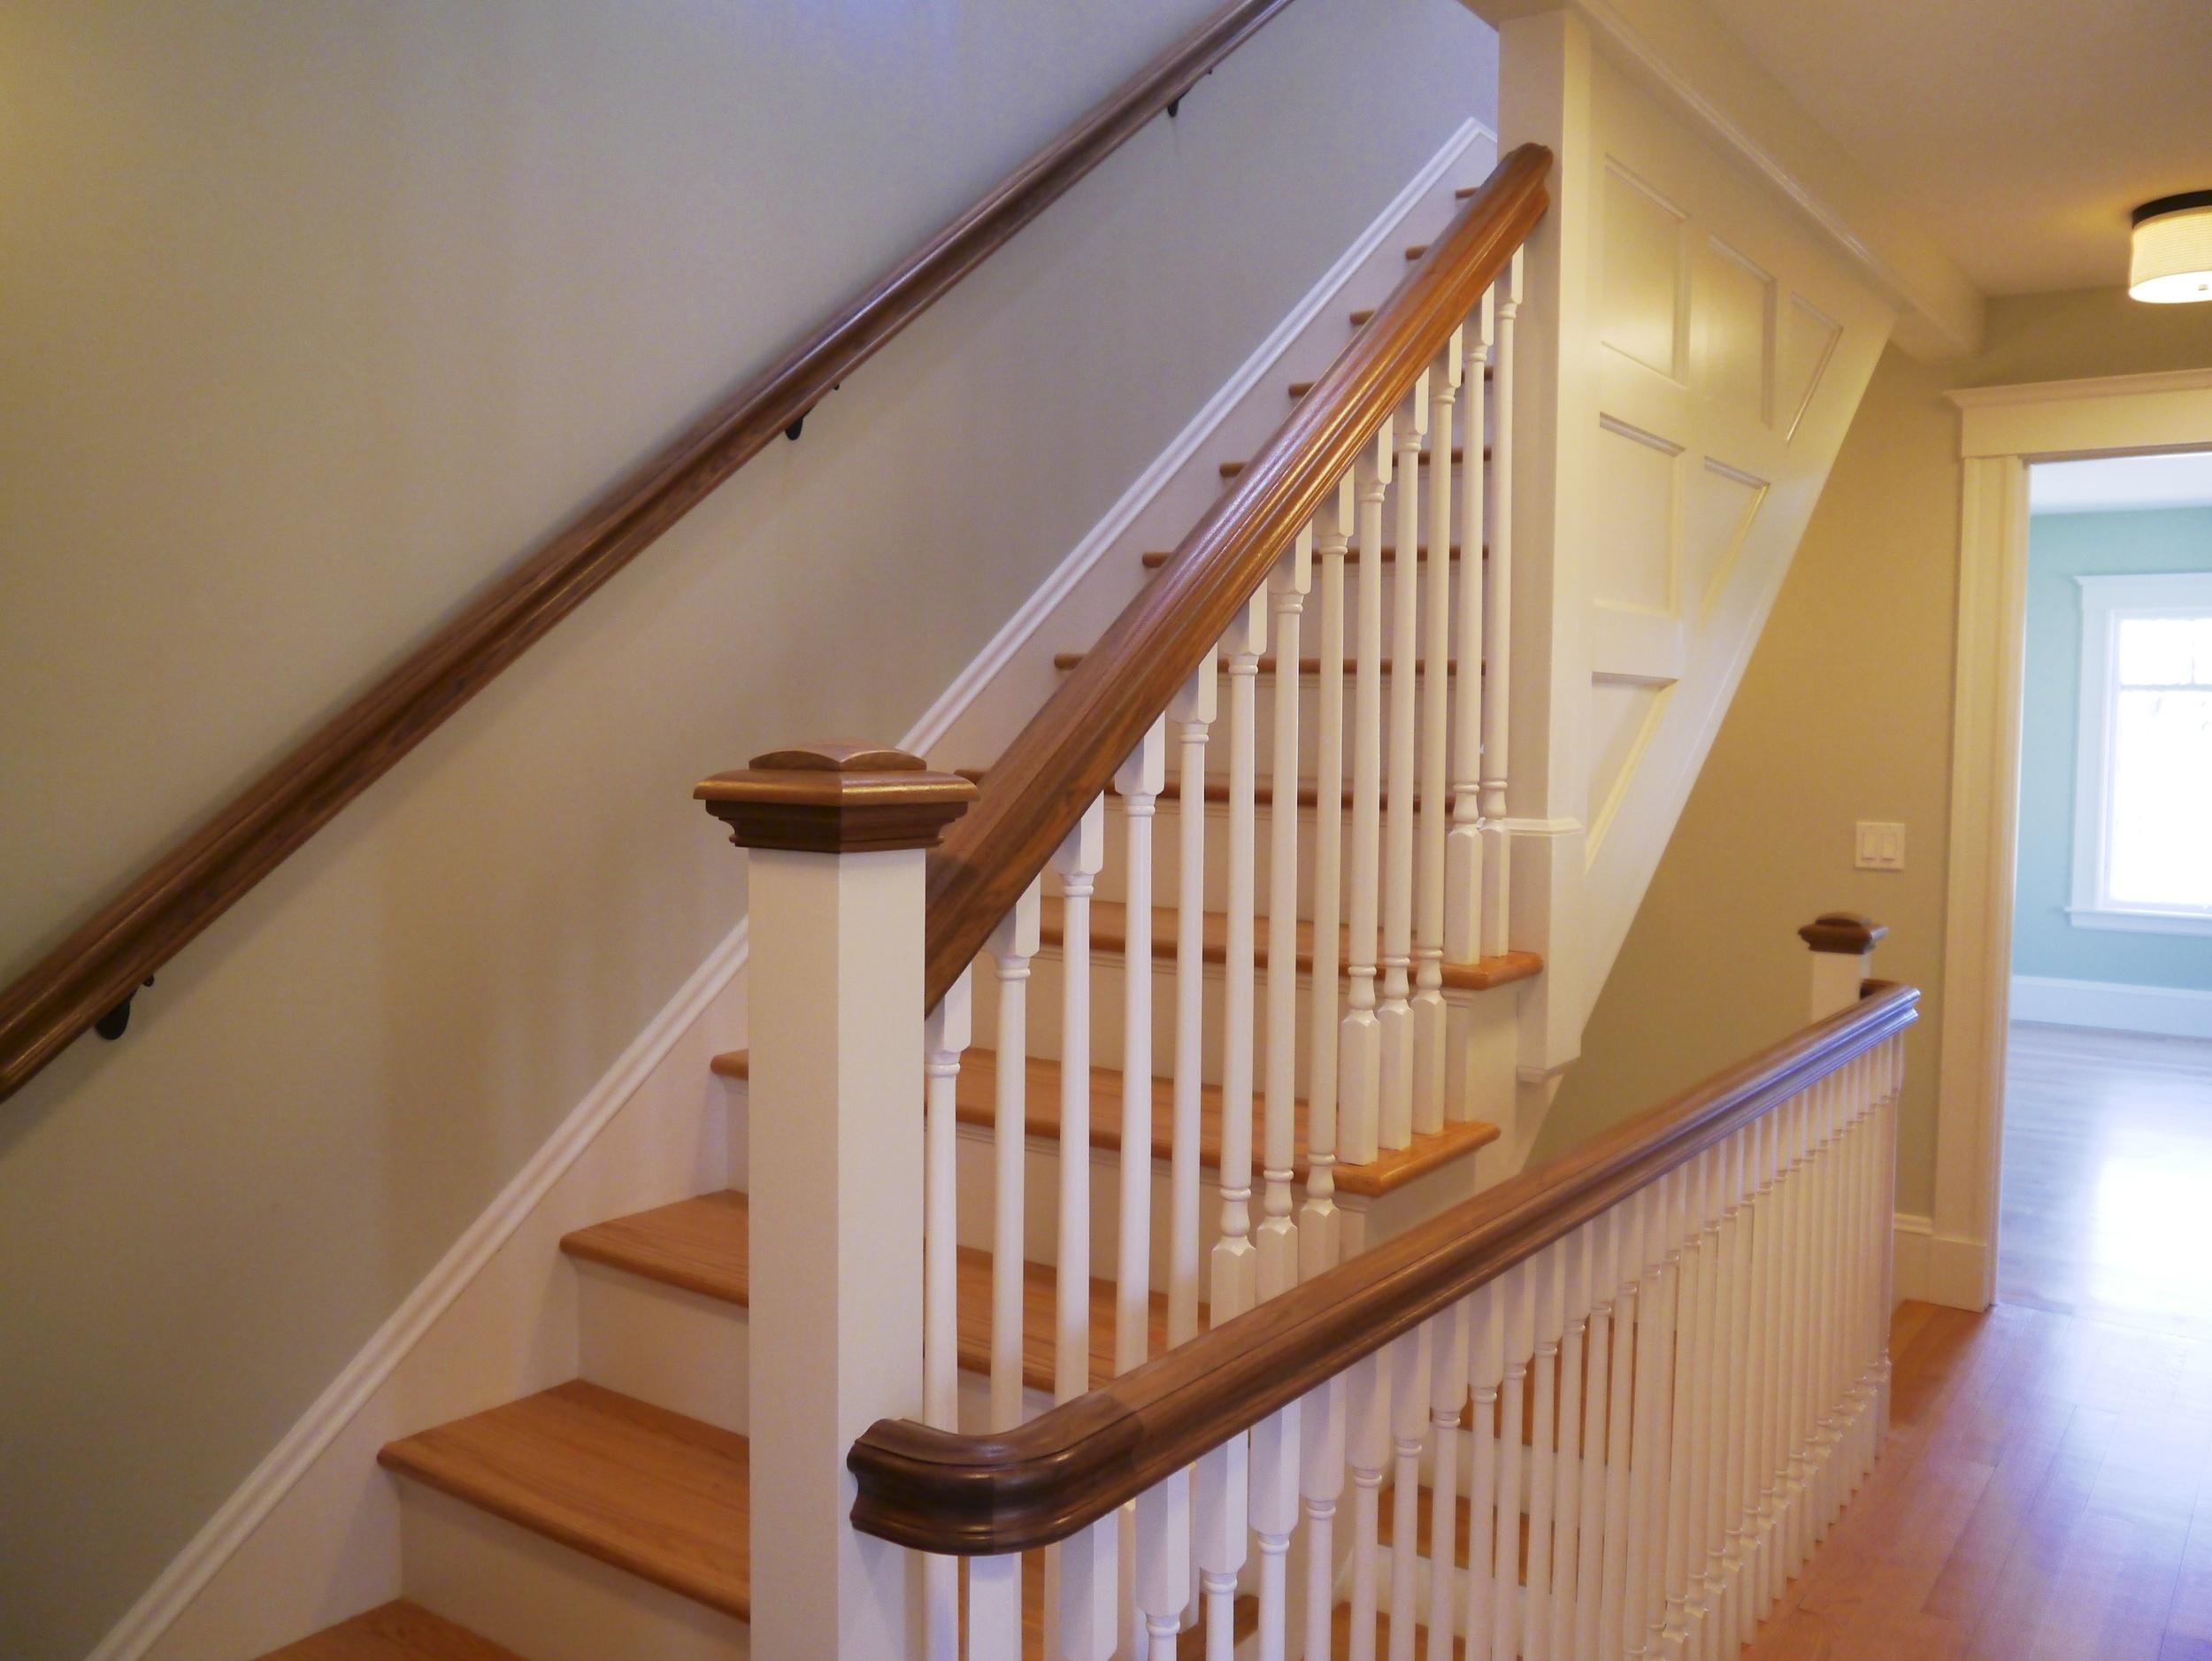 Baluster Stair detail Rhode Island